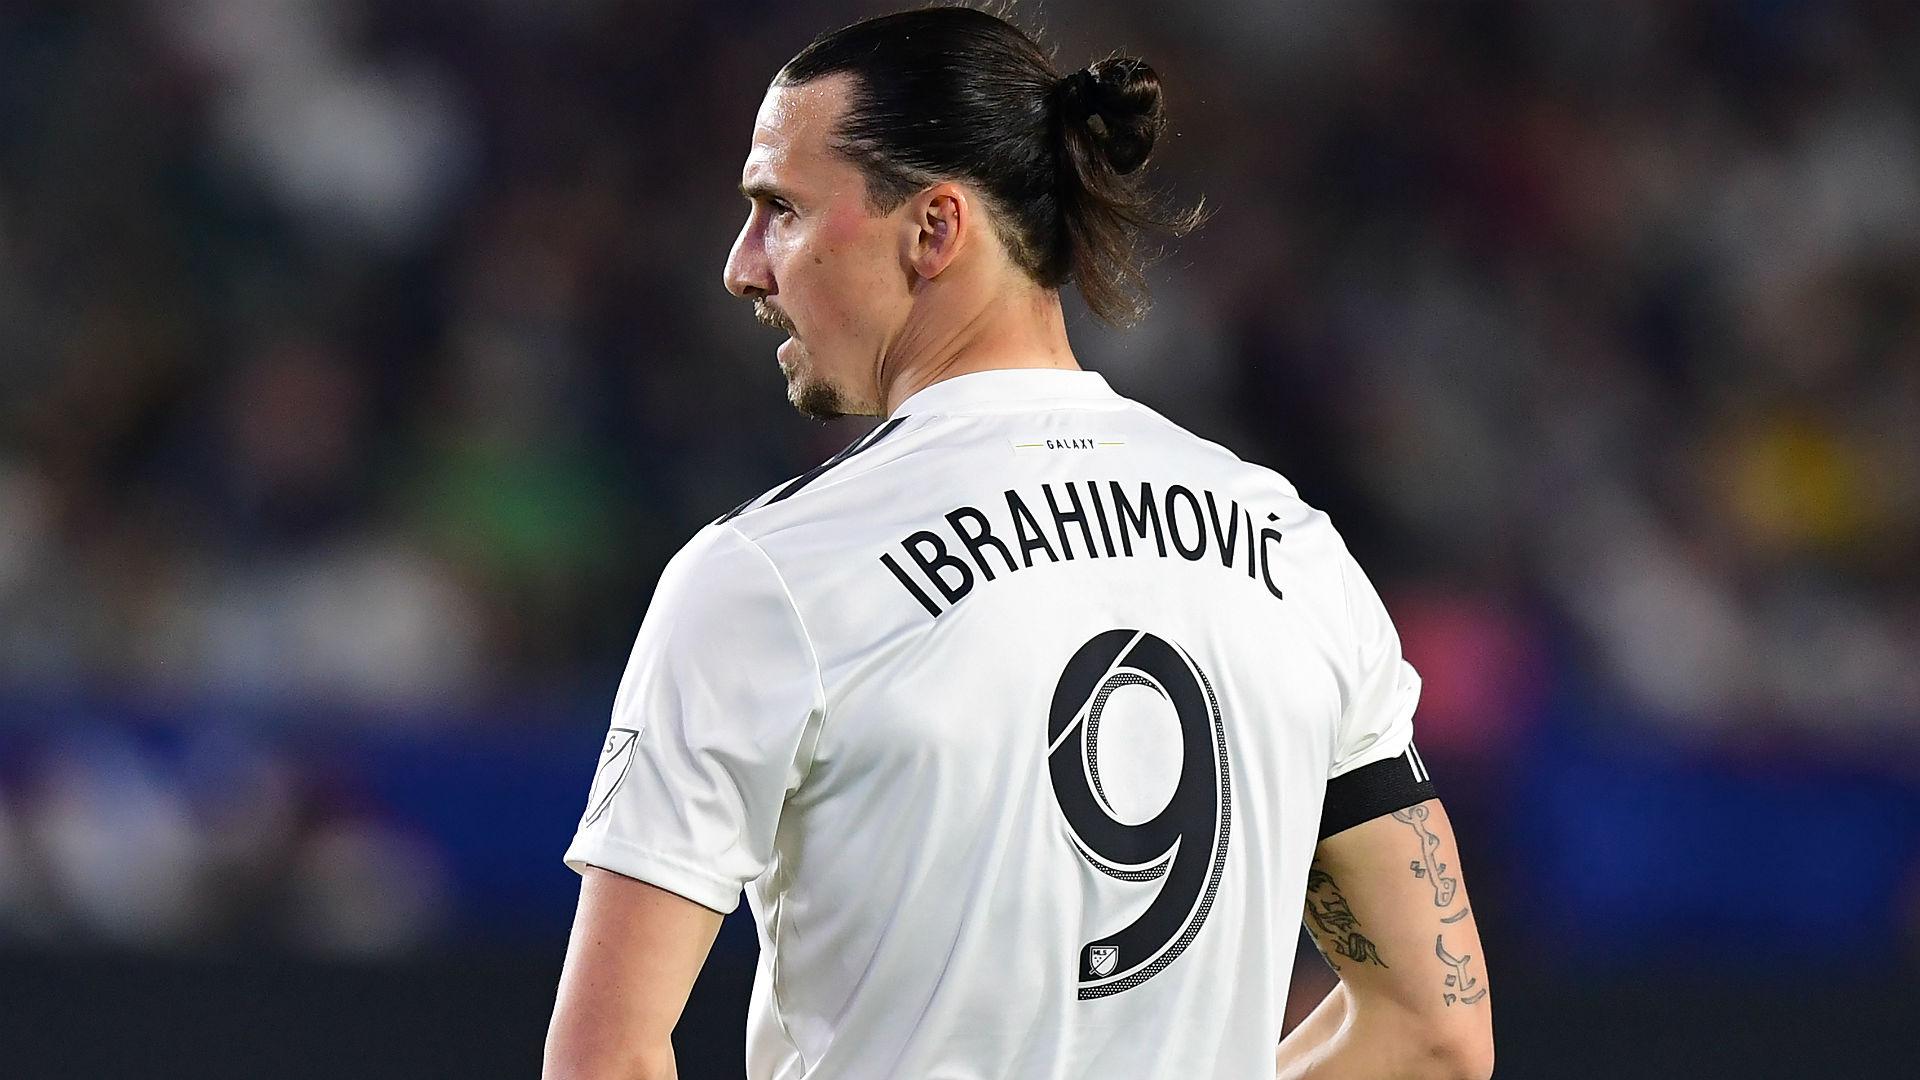 Ibrahimovic-Zlatan-USNews-091518-ftr-getty